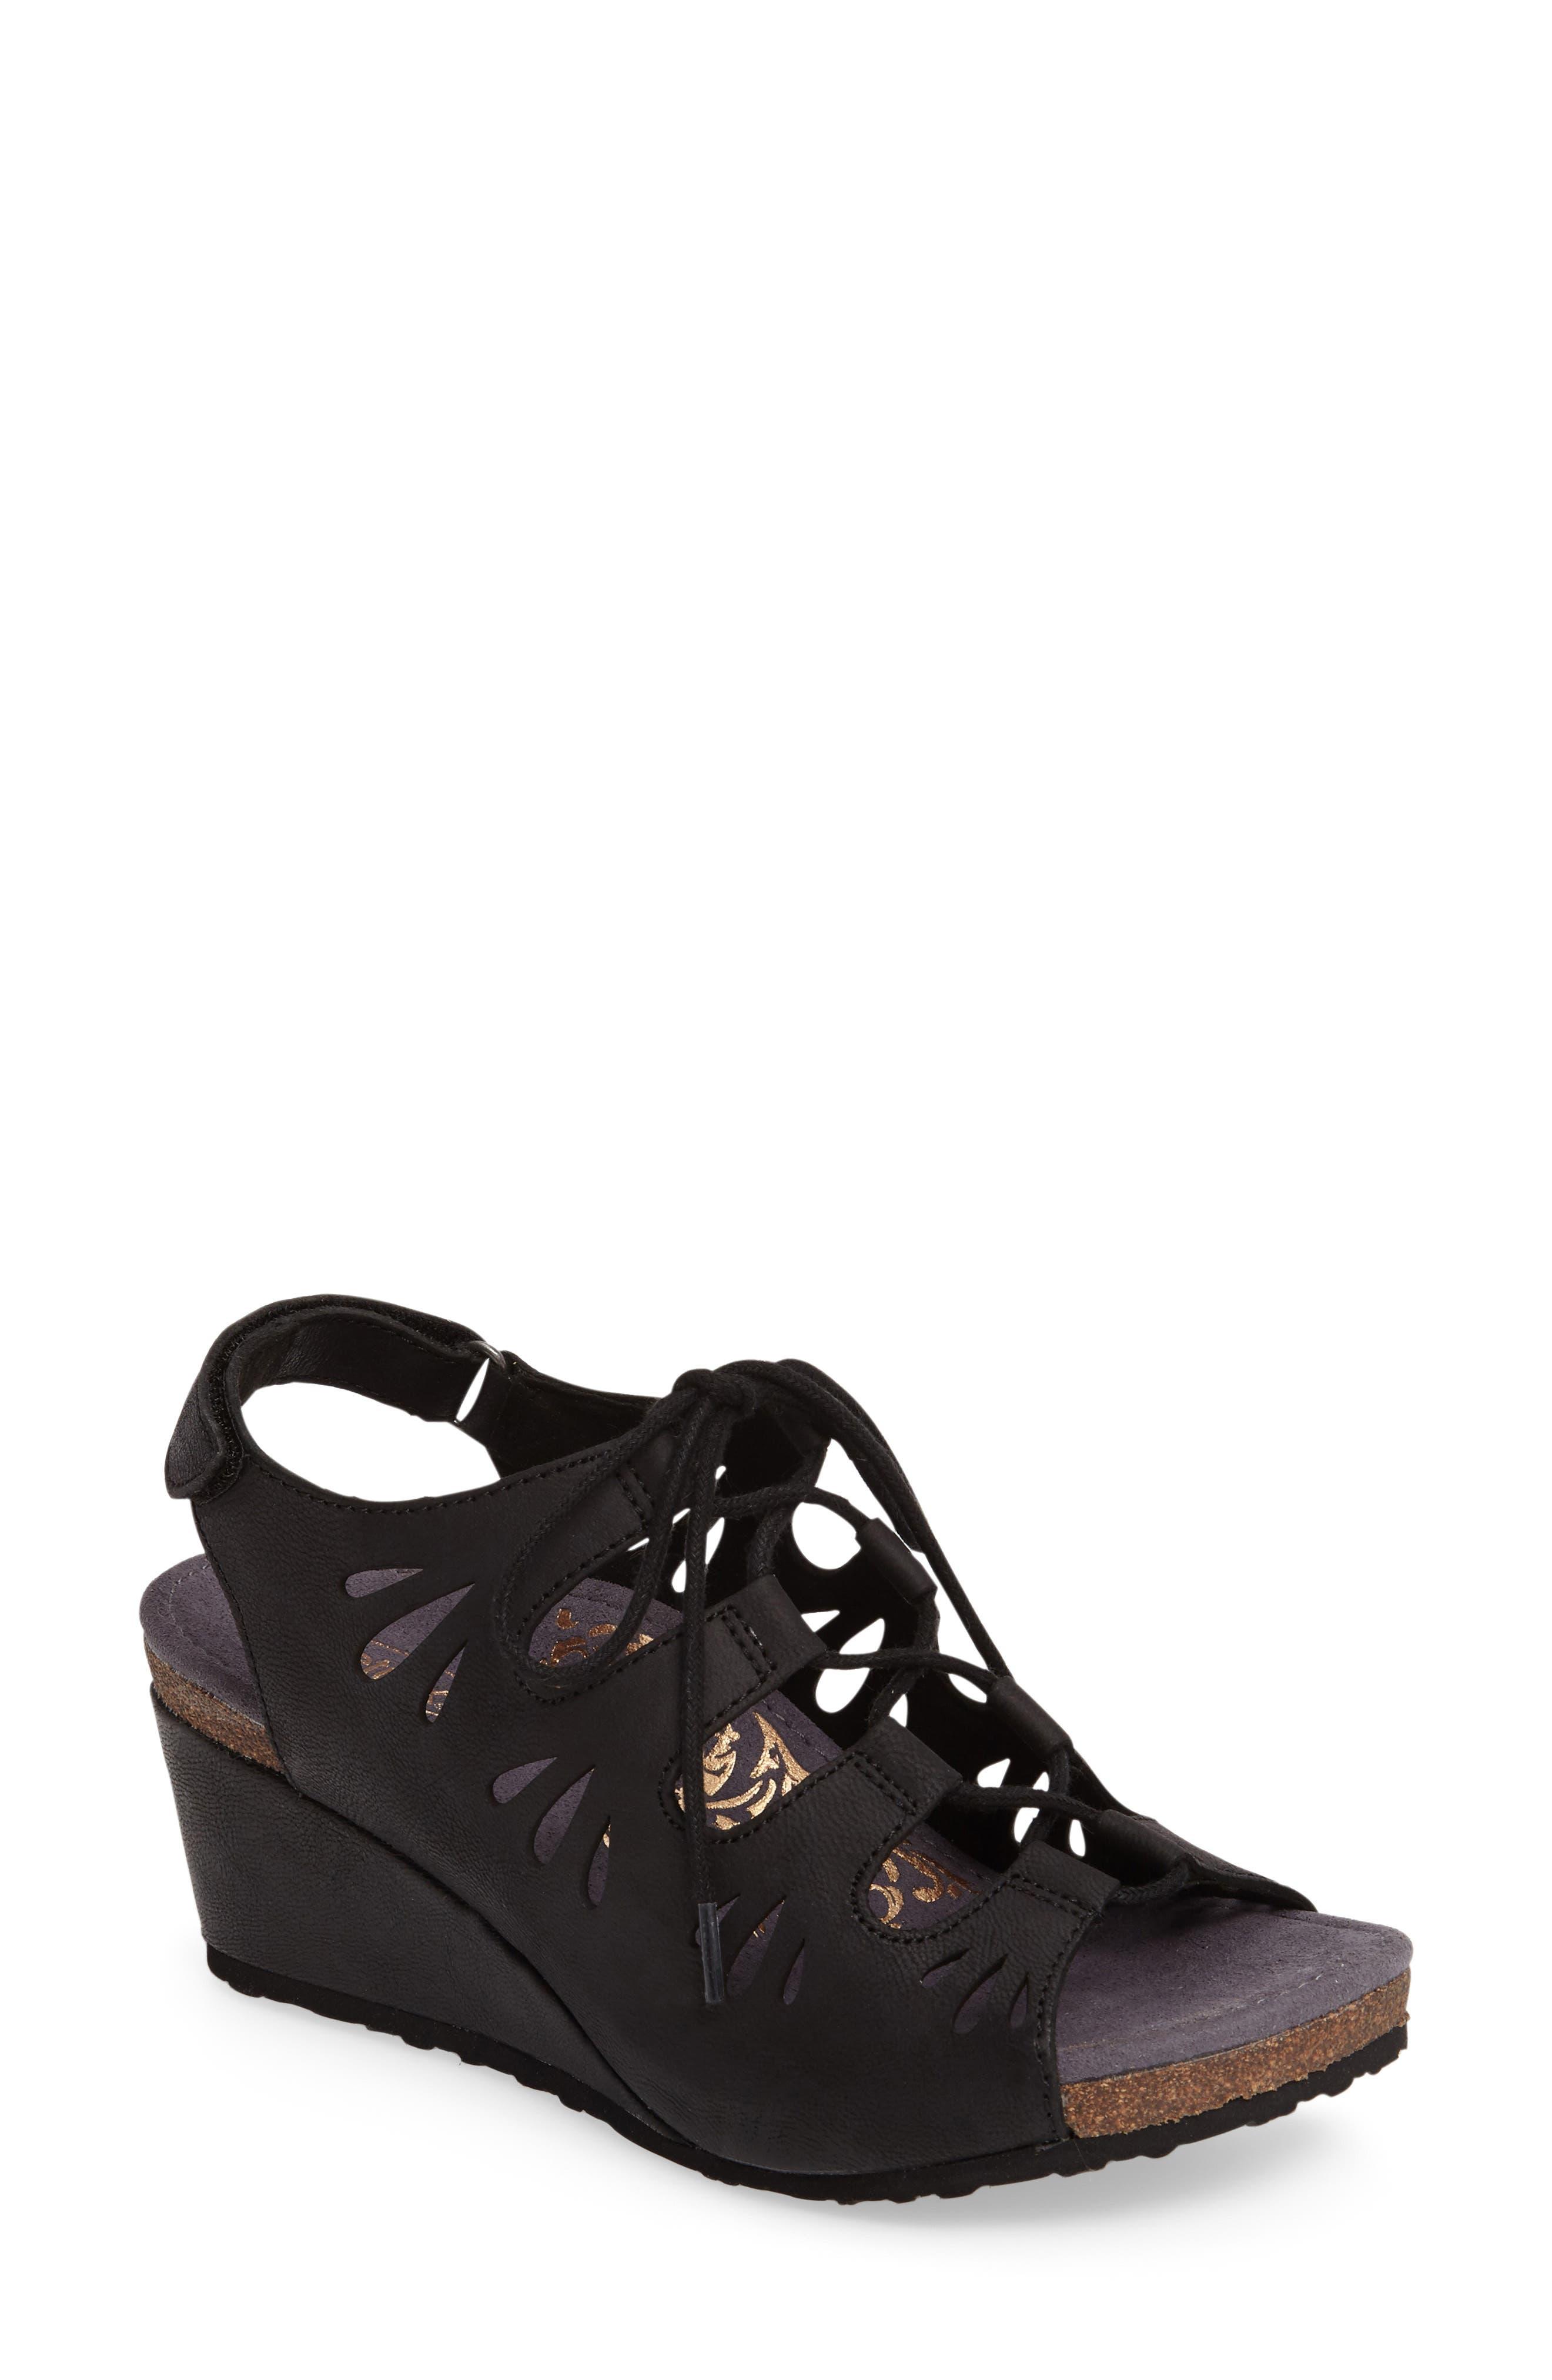 Giselle Slingback Wedge Sandal,                         Main,                         color, 001